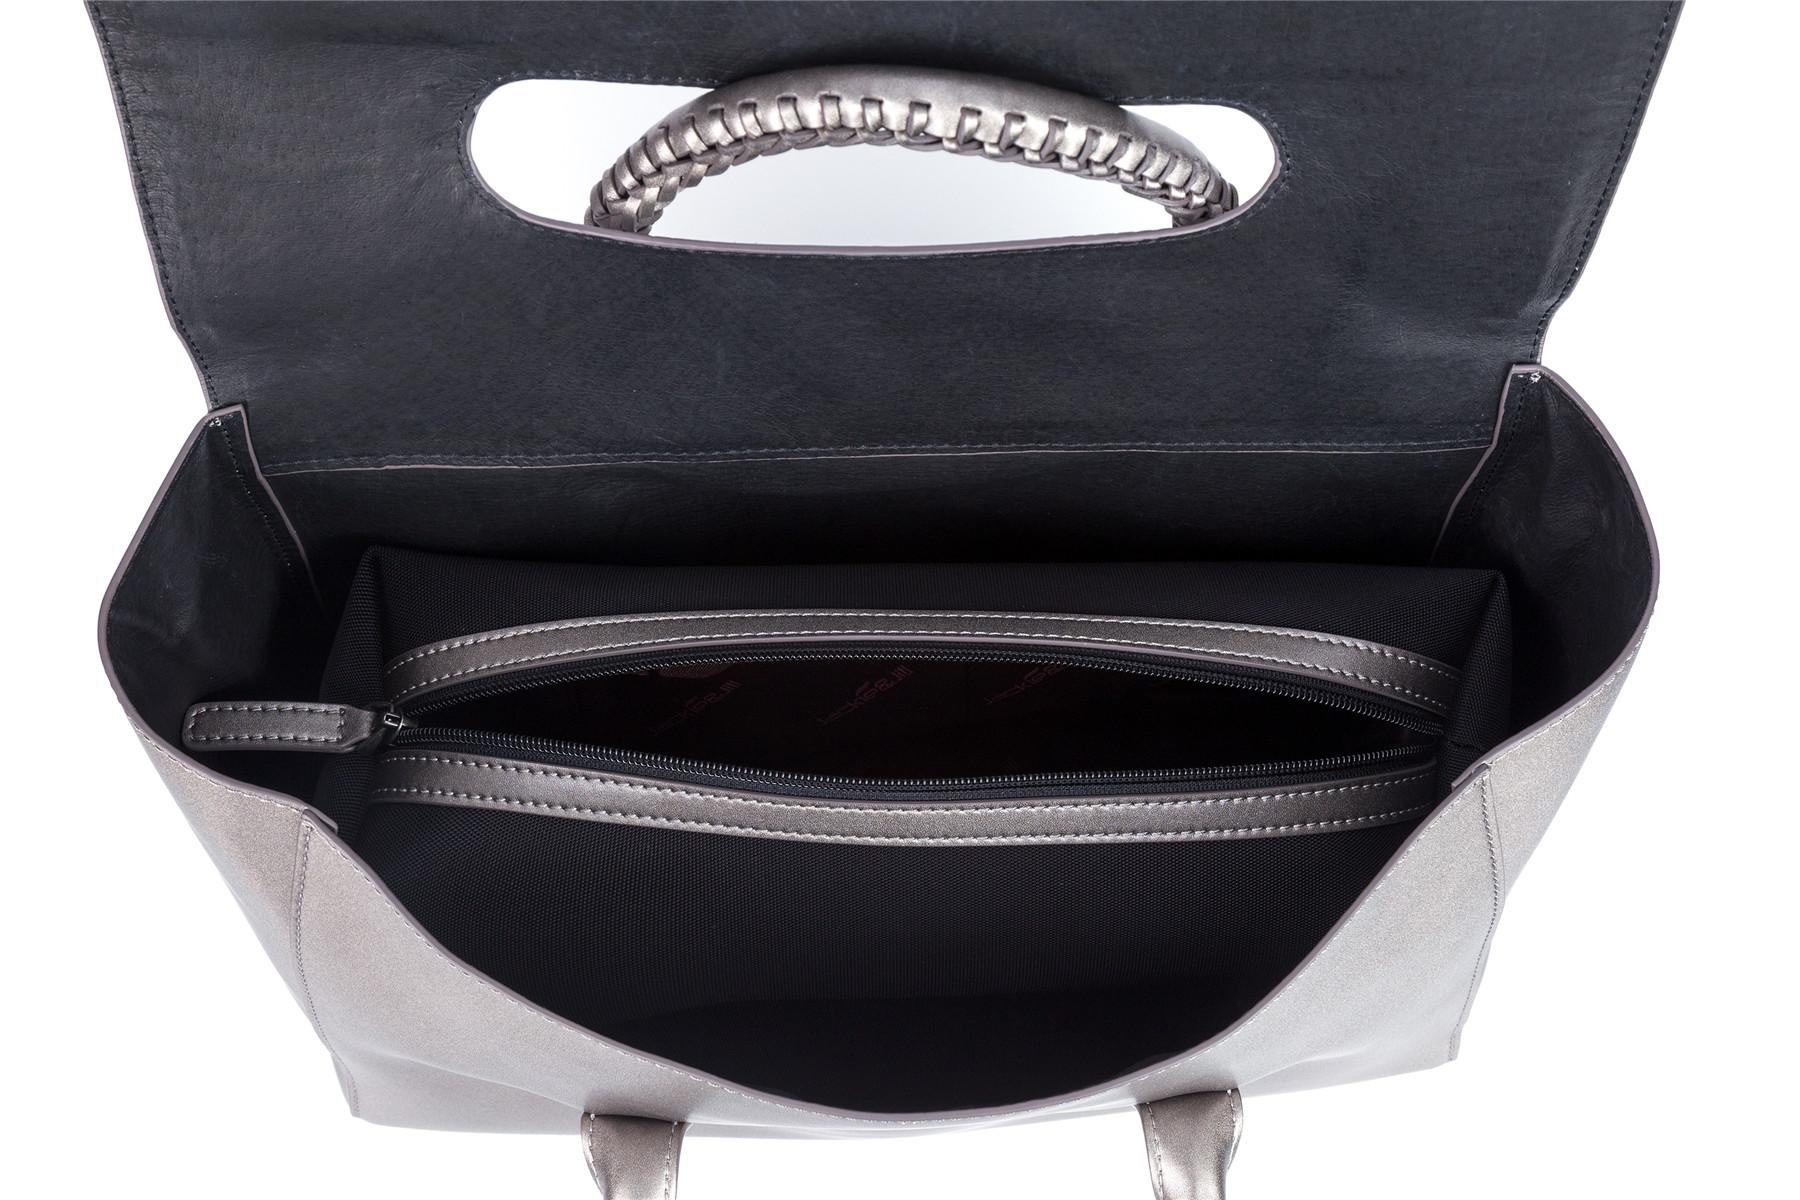 GF bags-Handbag Weaving handle microfiber leather cover closure-1